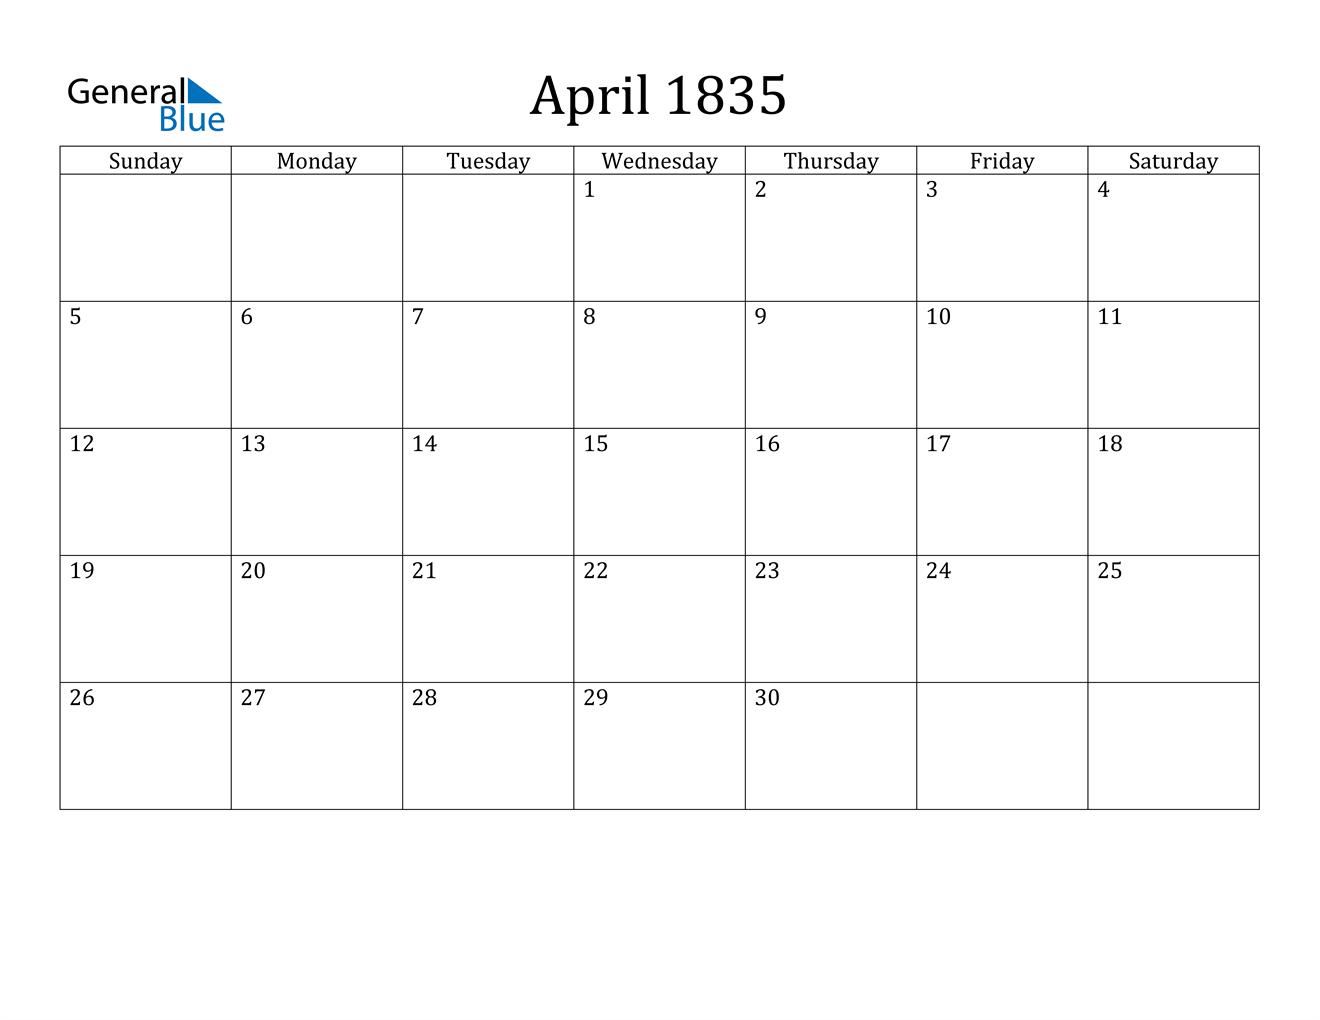 Image of April 1835 Calendar